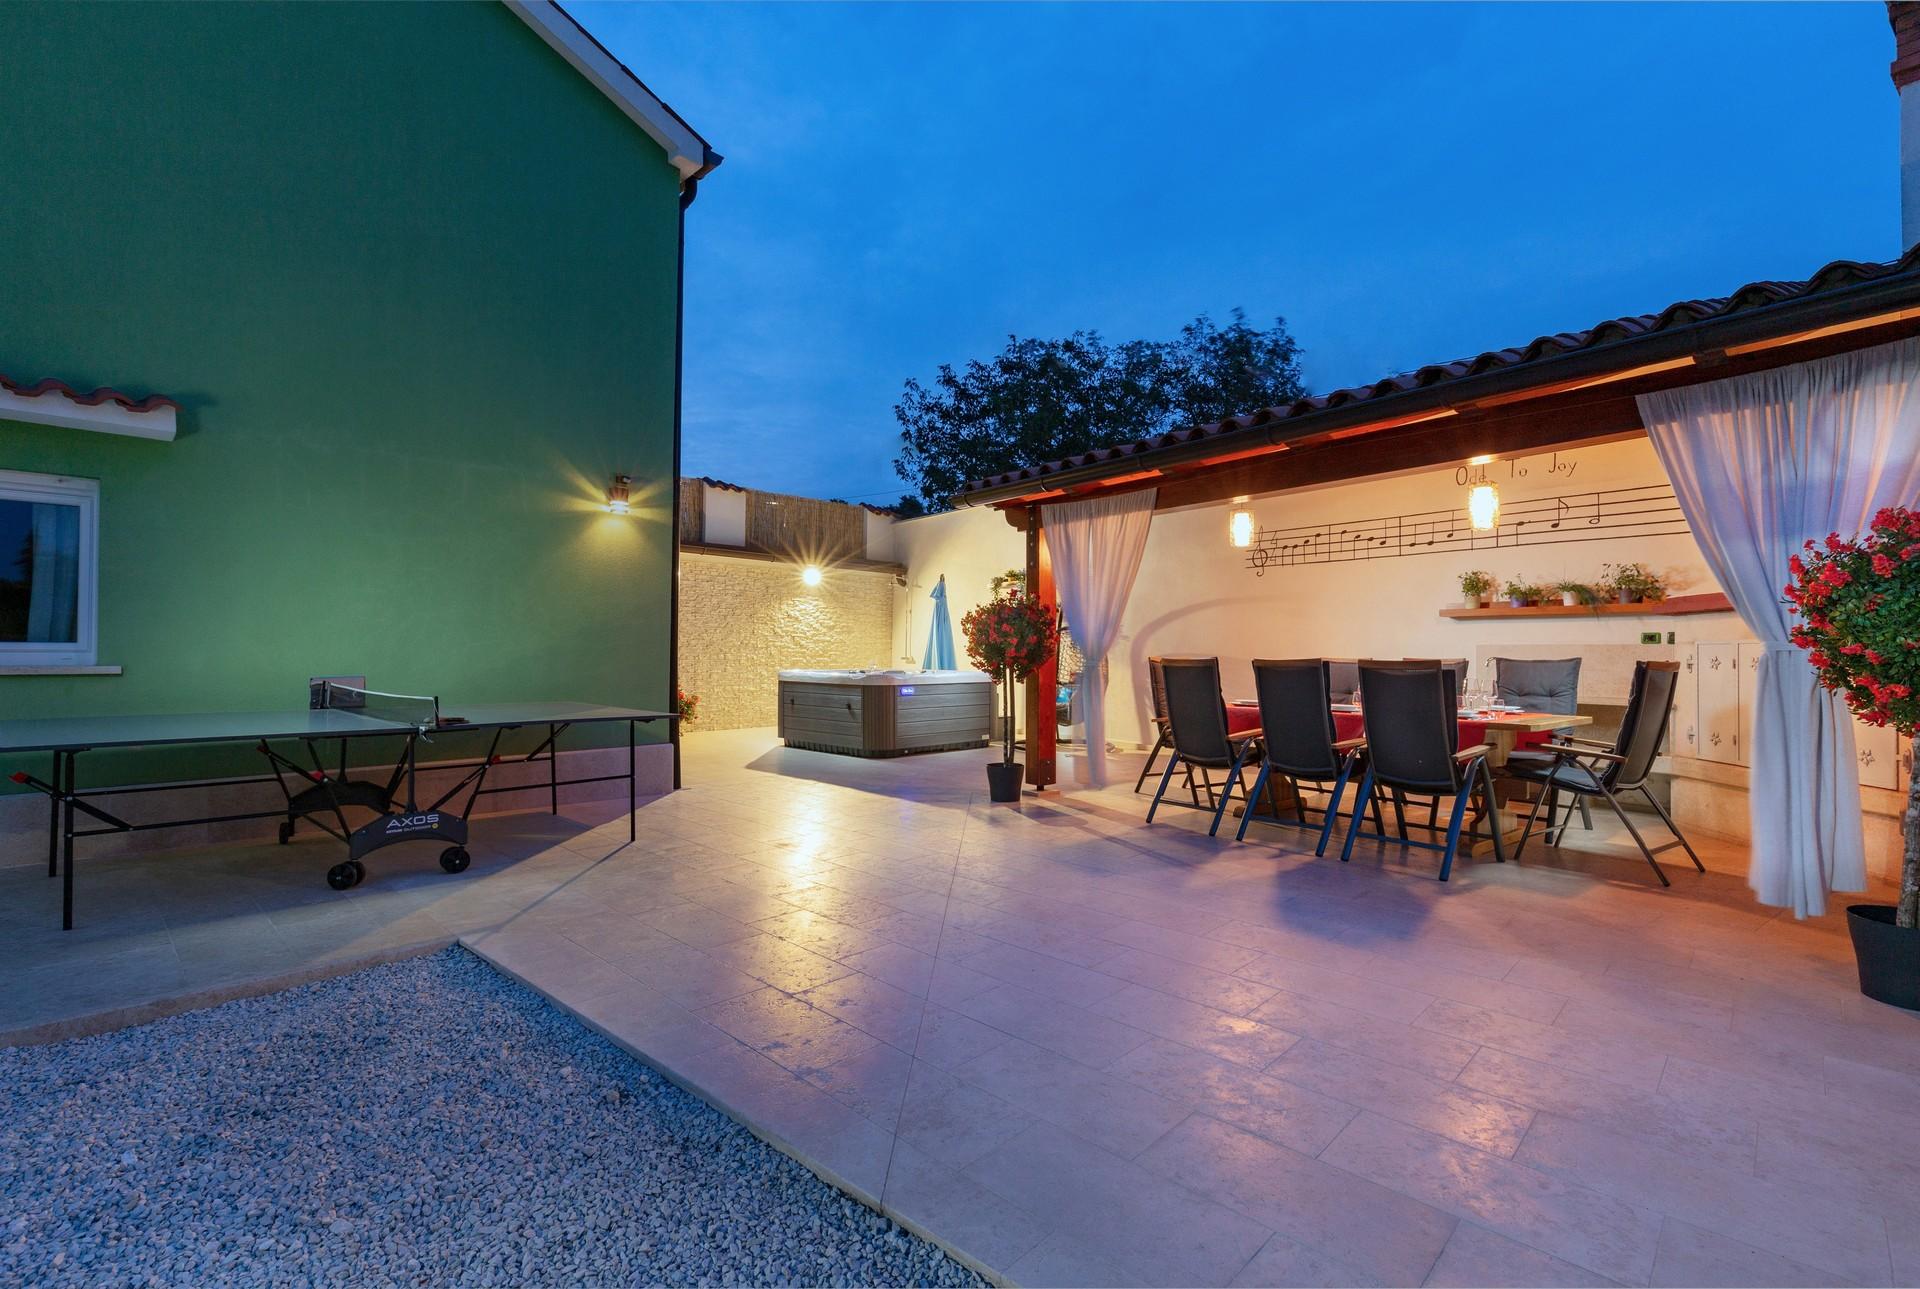 villa deal outdoors (17)